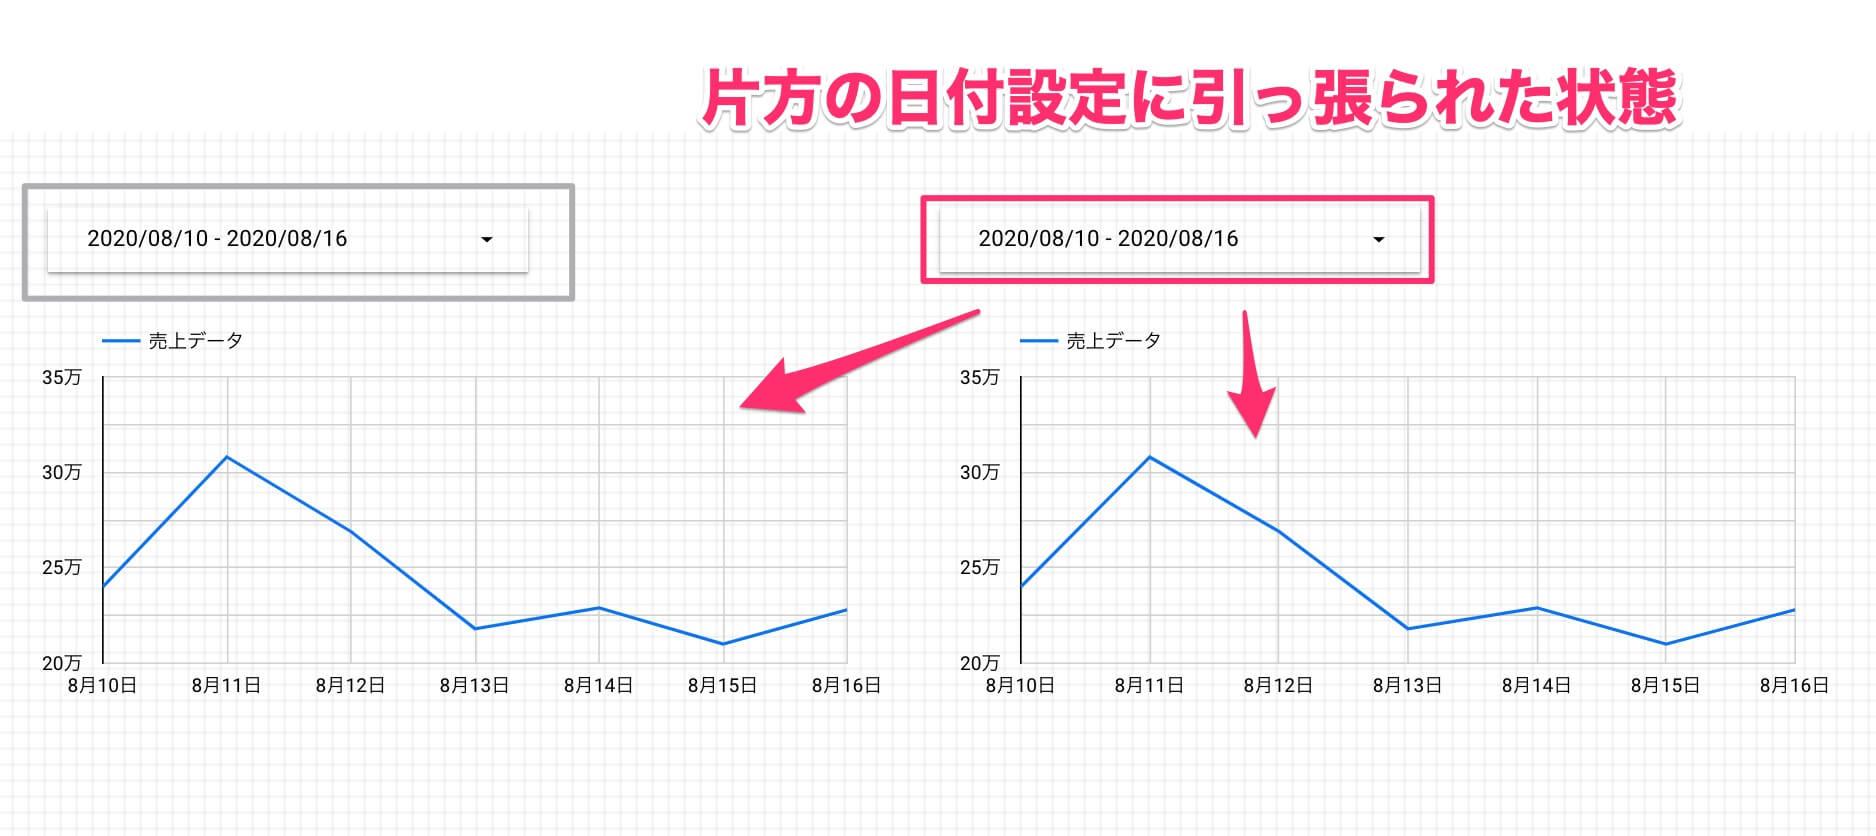 【Googleデータポータル】1画面に2つの期間を並べて比較。複数のコンポーネントを「グループ」にする方法